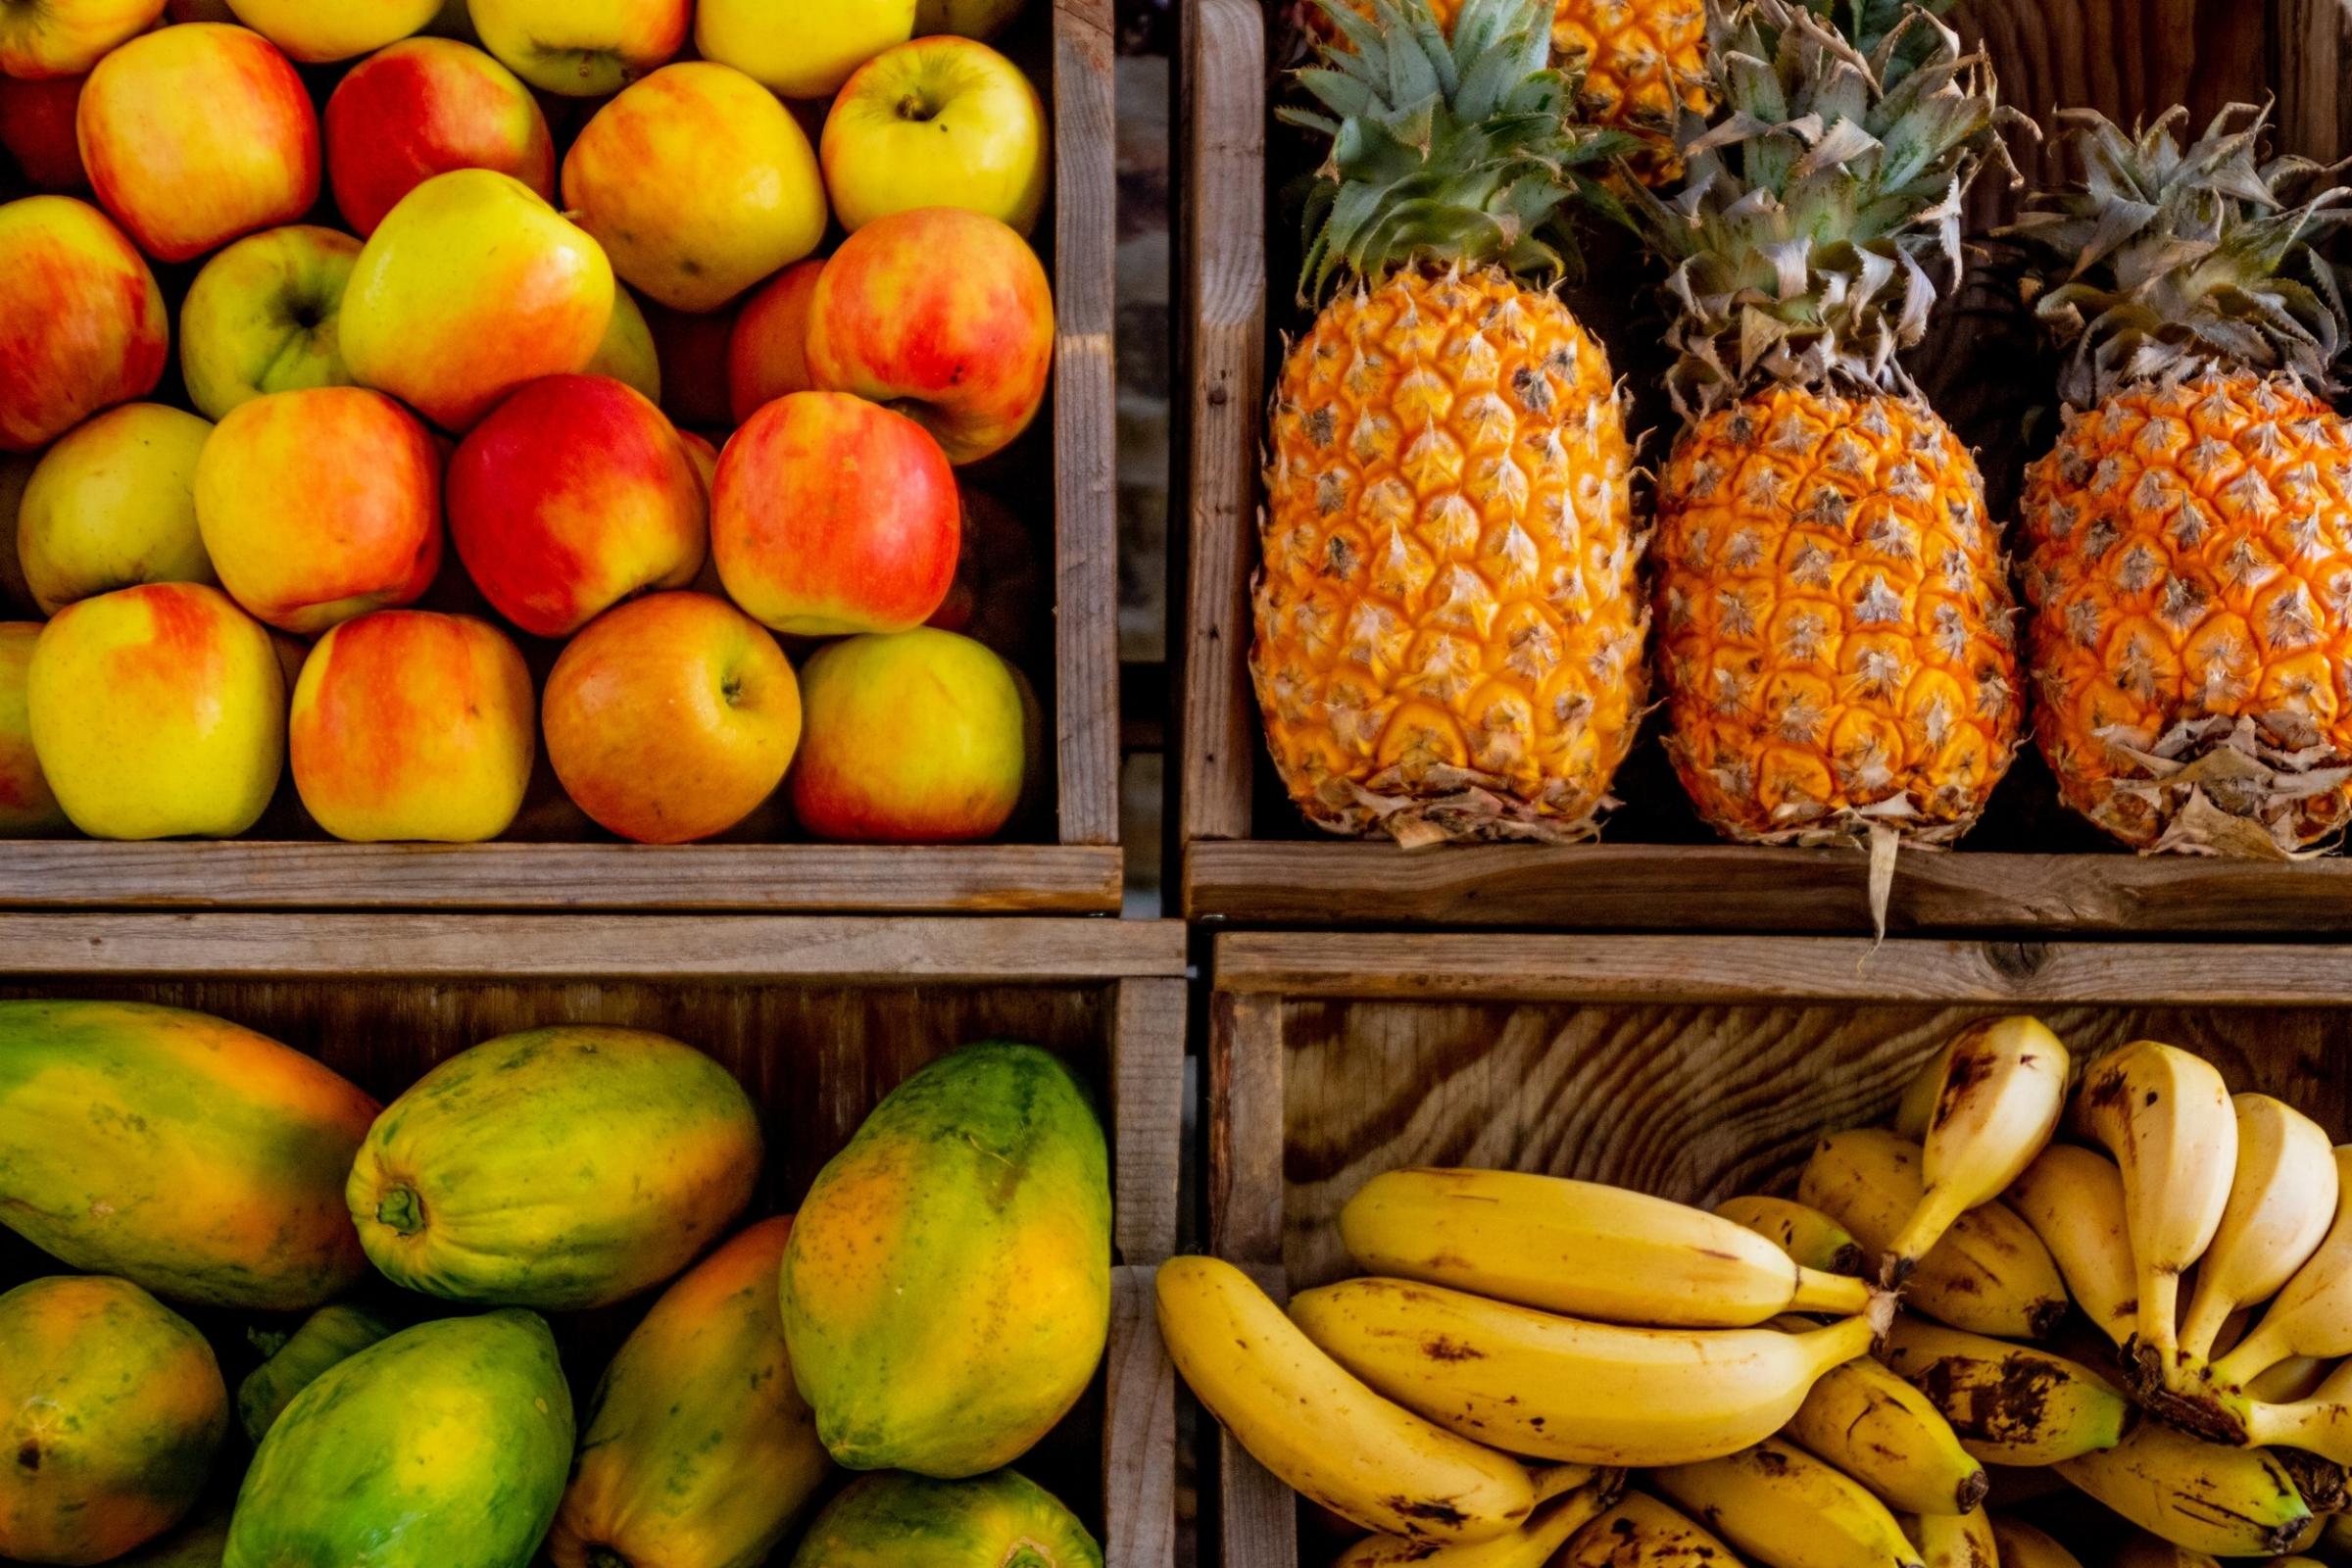 abundance-apples-bananas-1300975.jpg